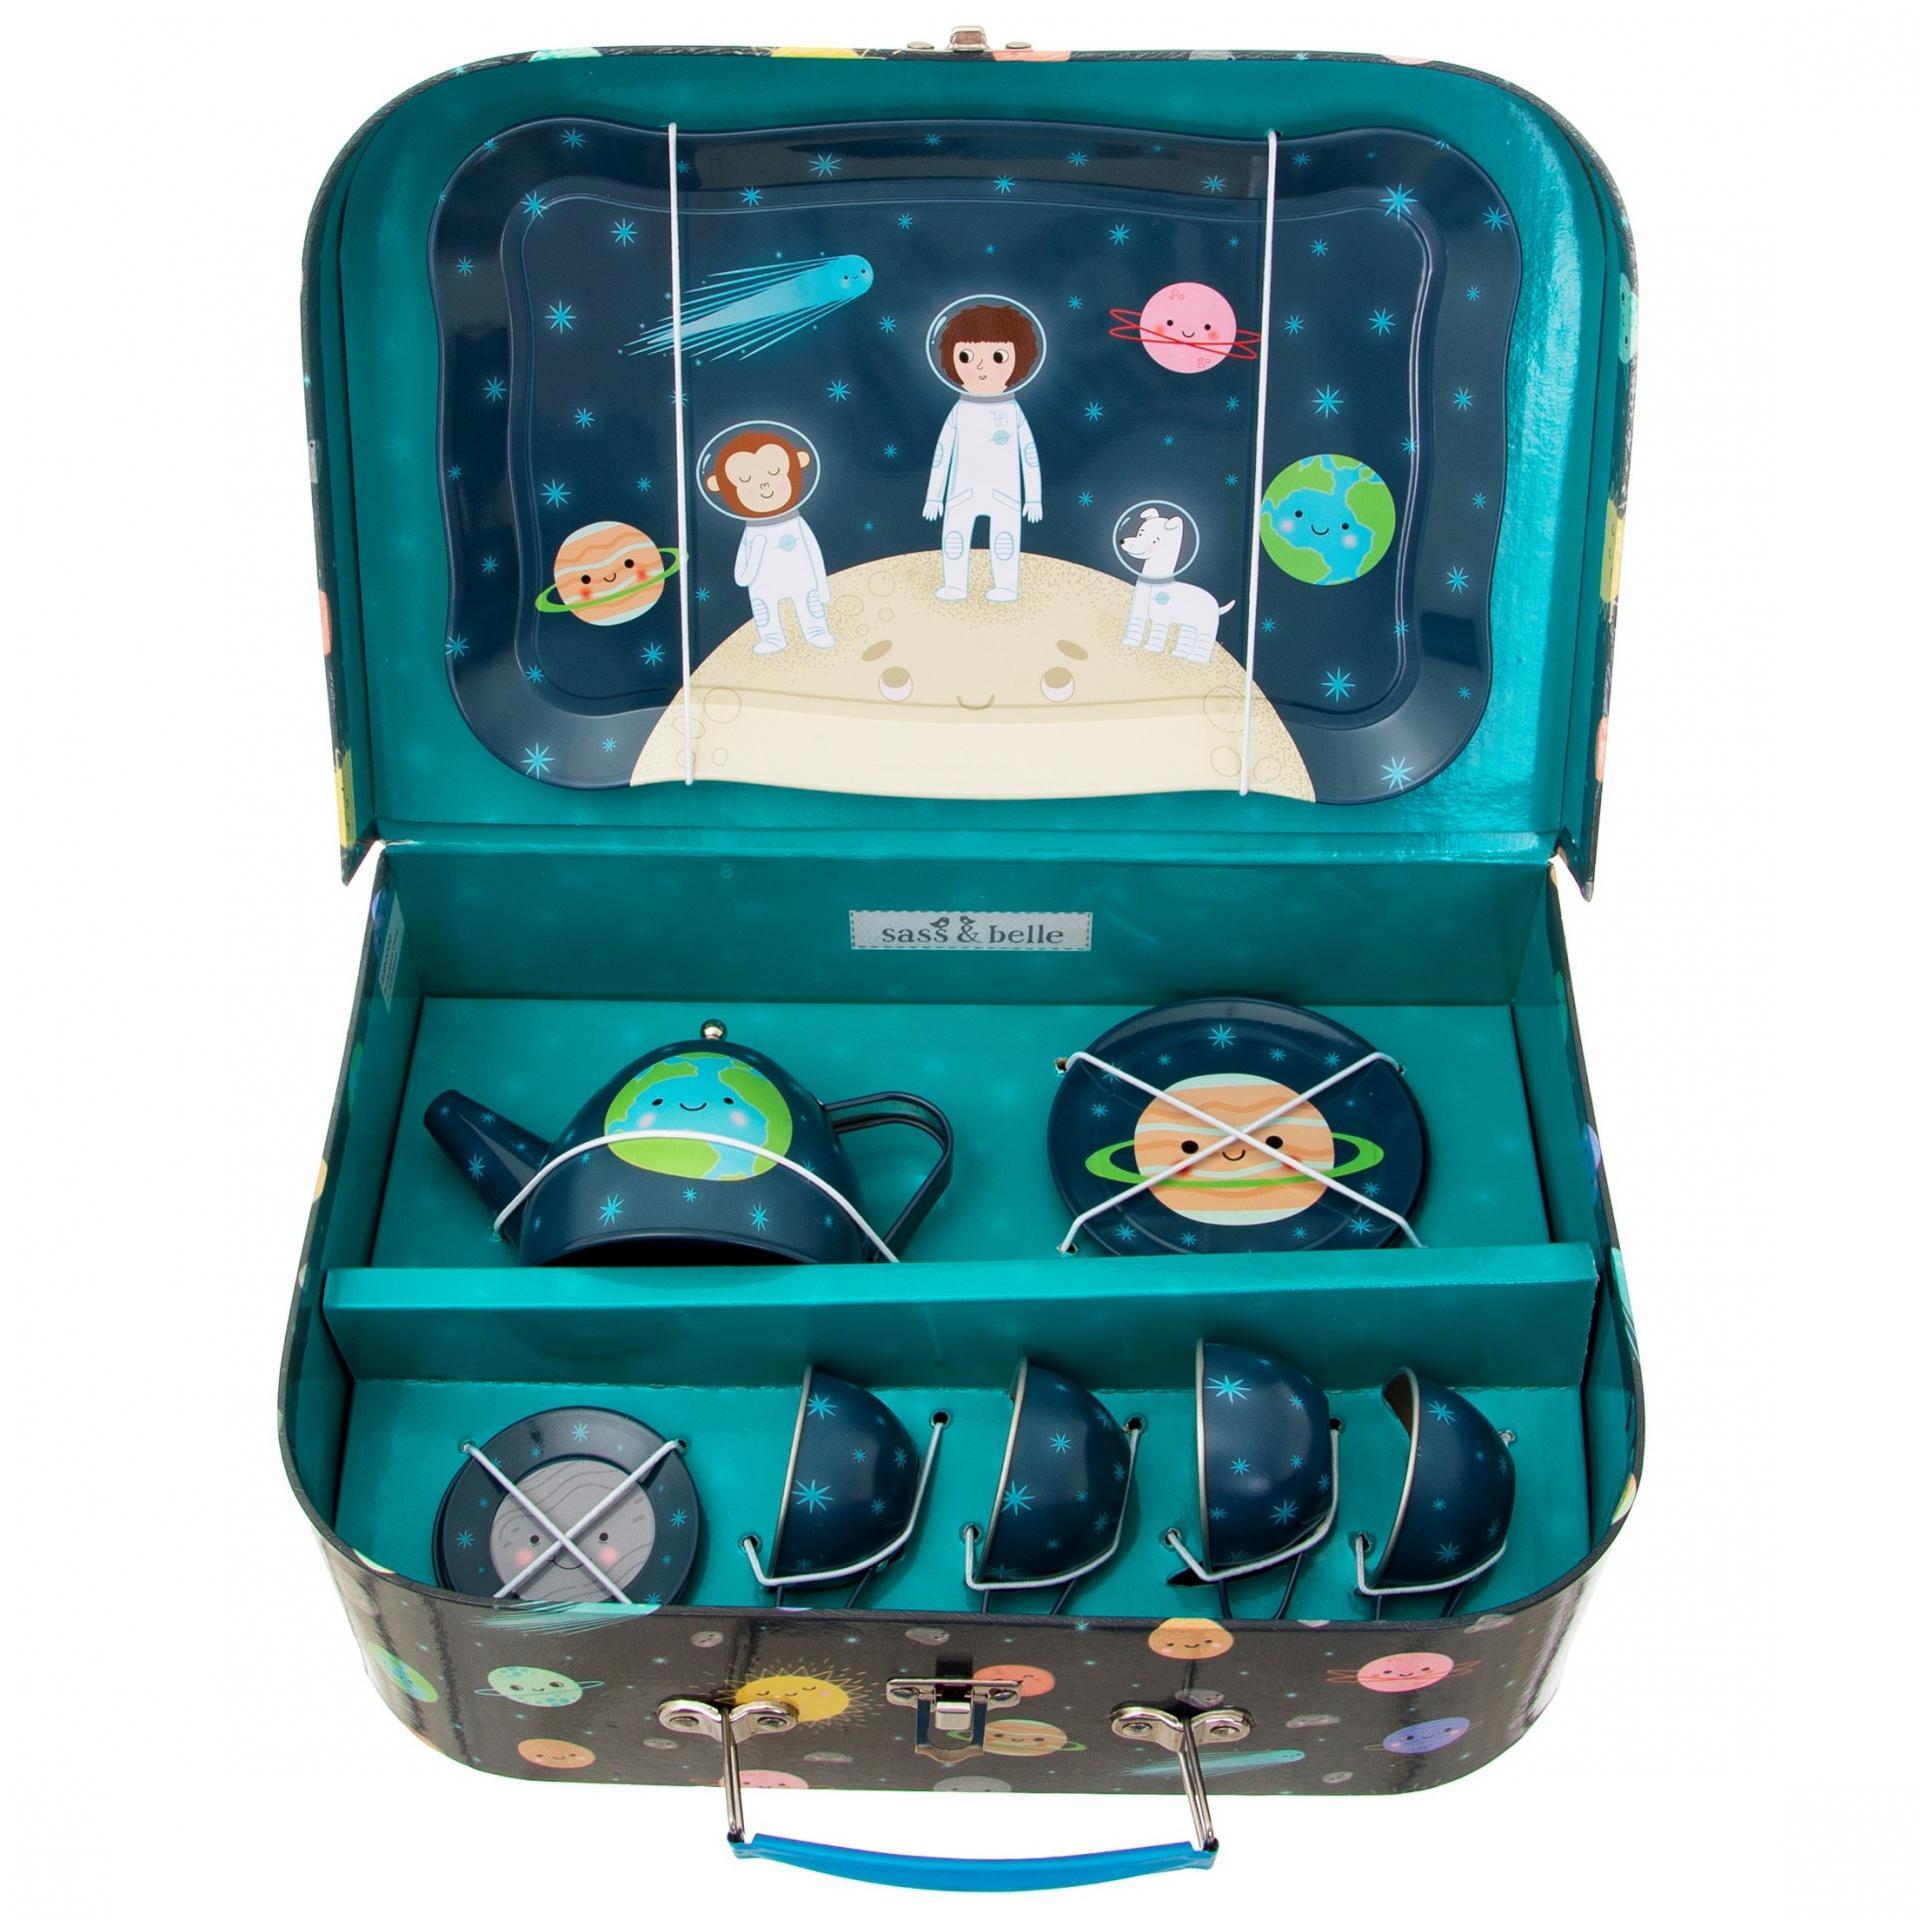 sass & belle Dětský čajový set Space Explorer, modrá barva, kov, papír